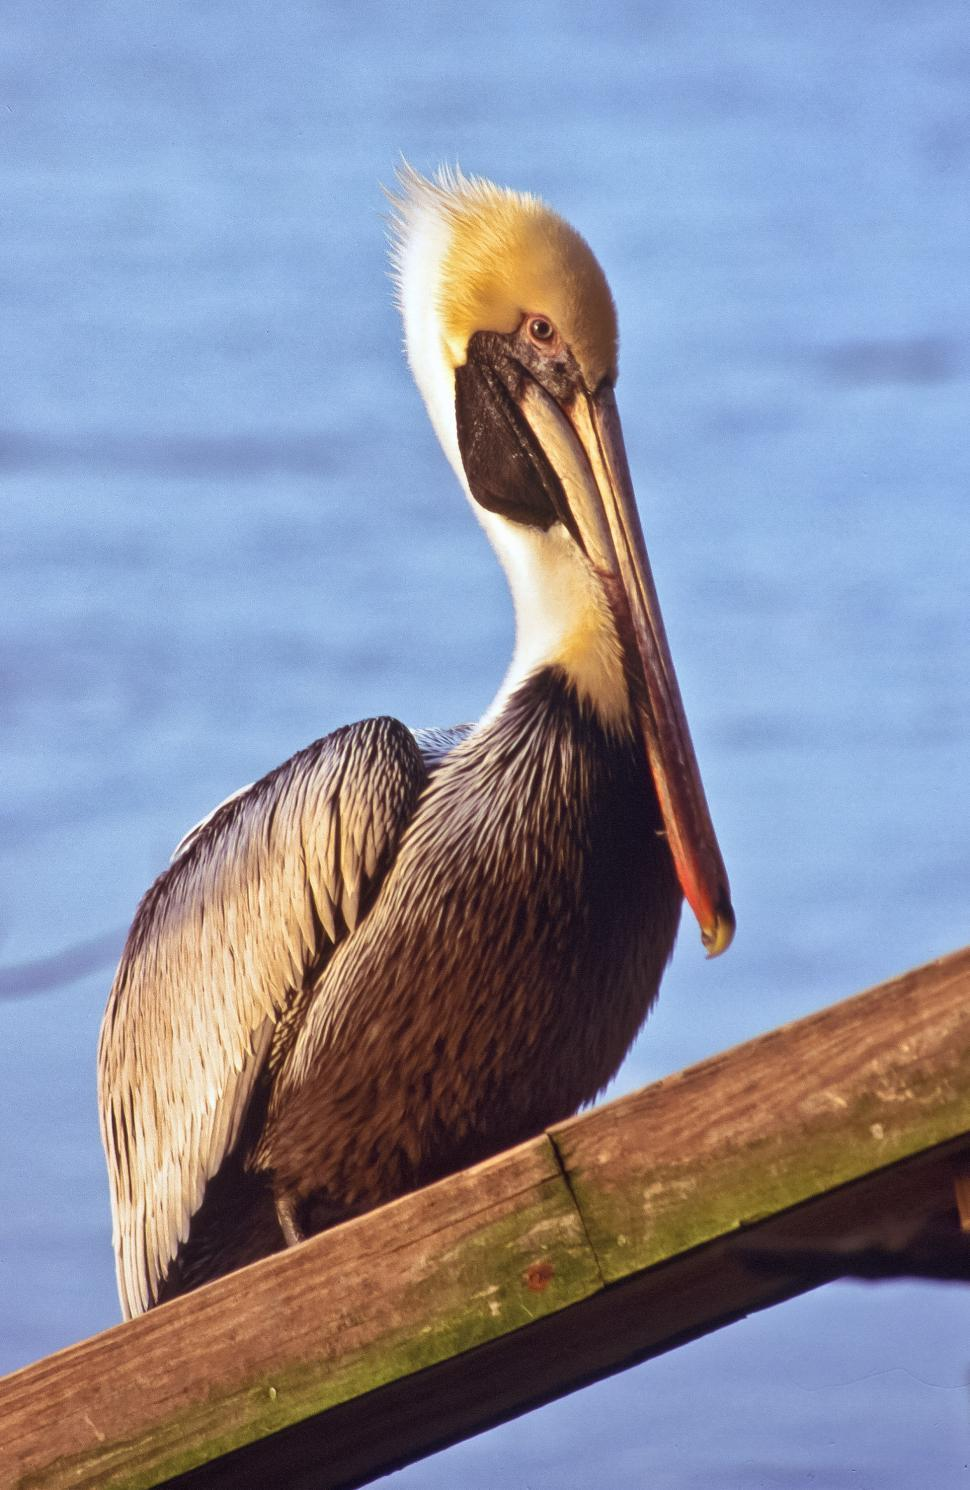 Download Free Stock HD Photo of Pelican Near Water Online